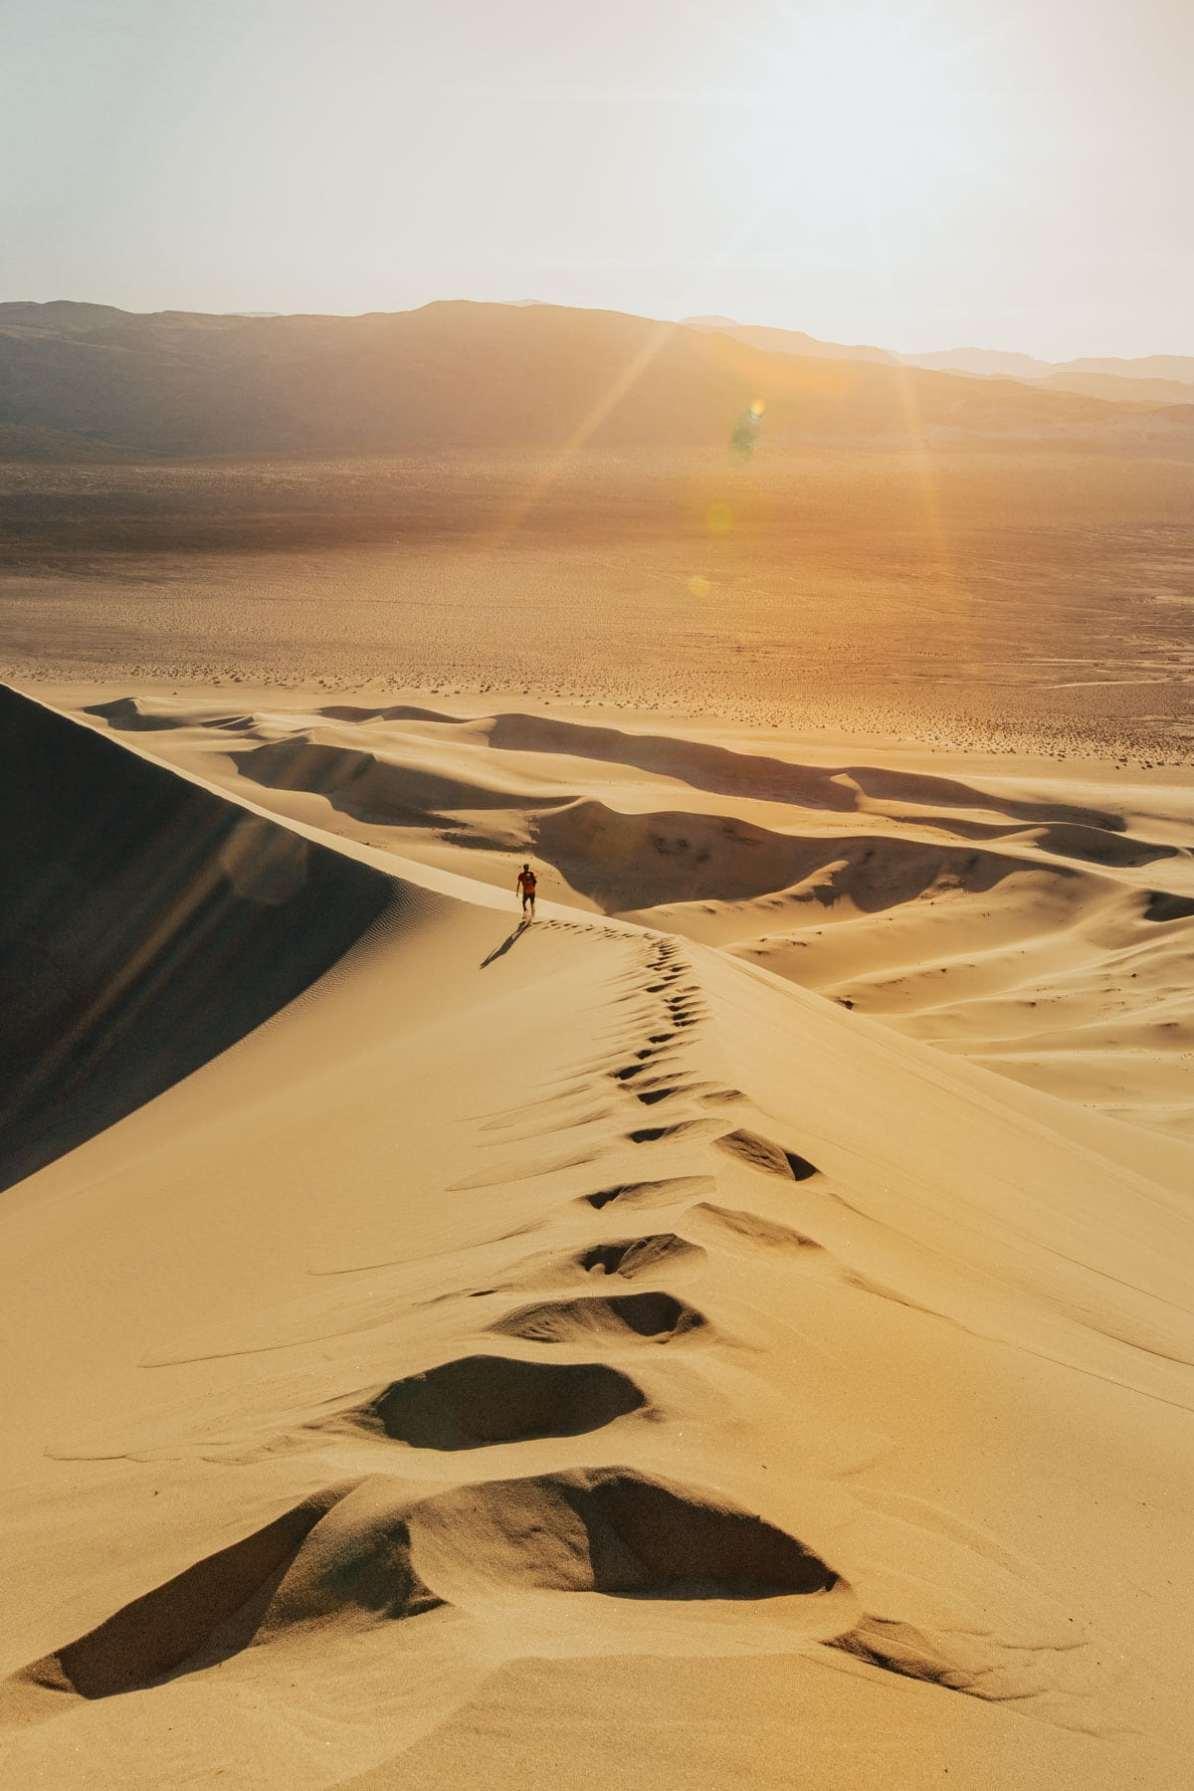 eureka dunes death valley national park, california